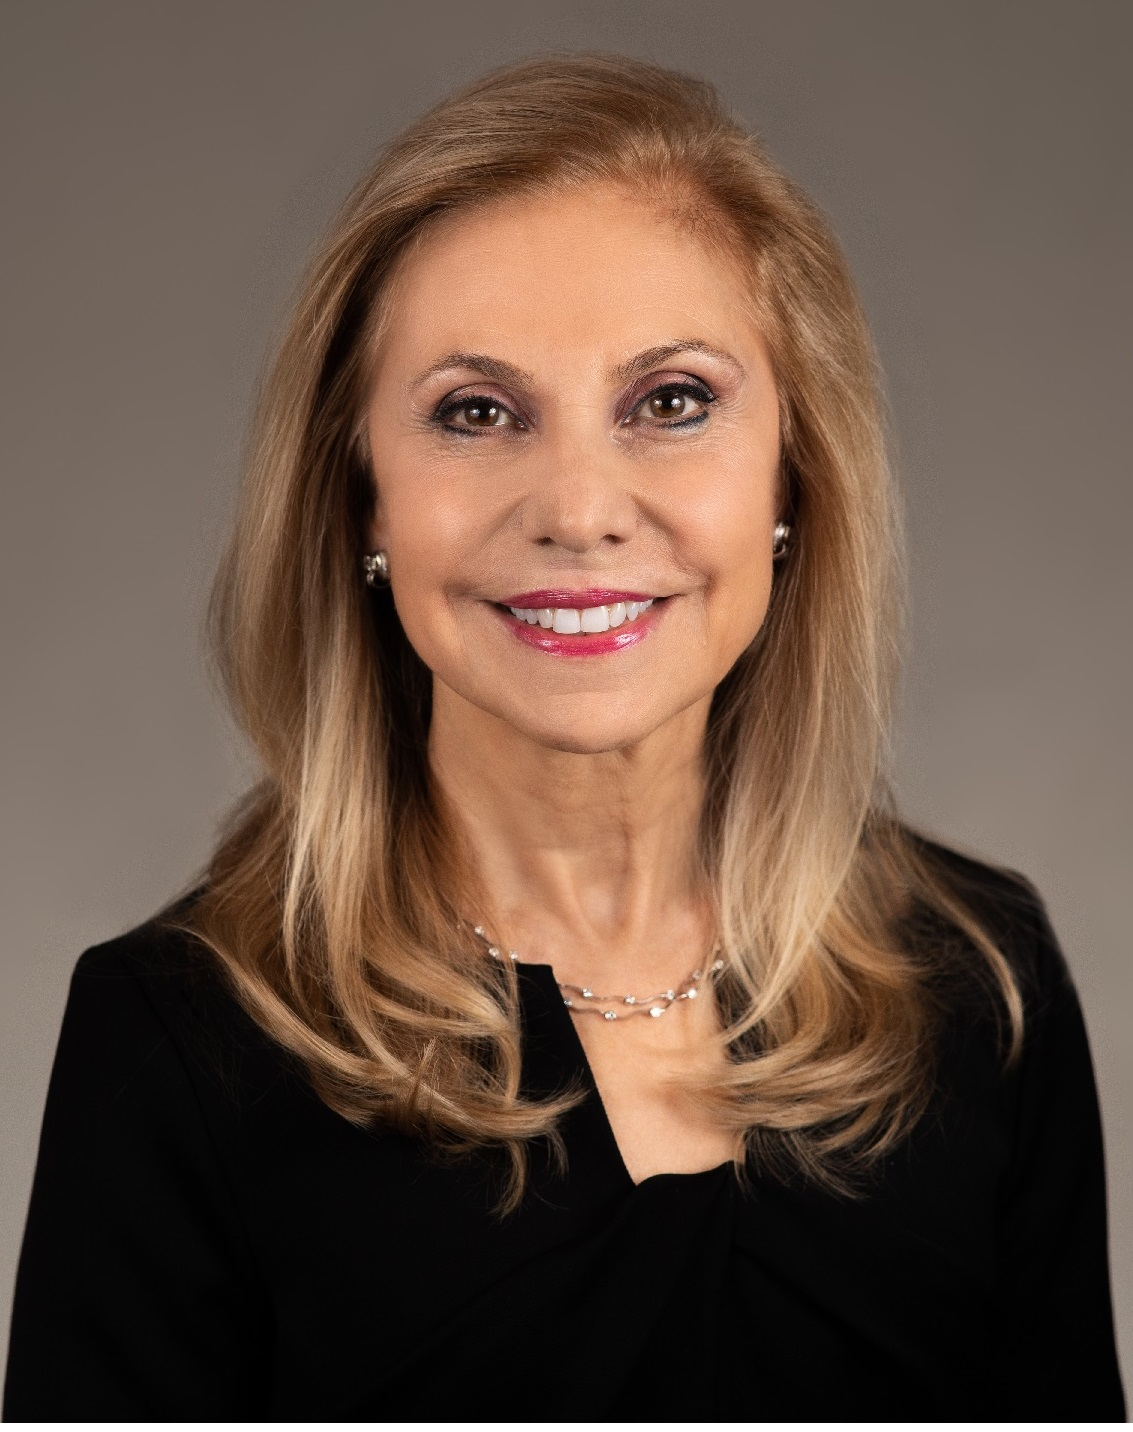 Dr. Cynthia Matossian